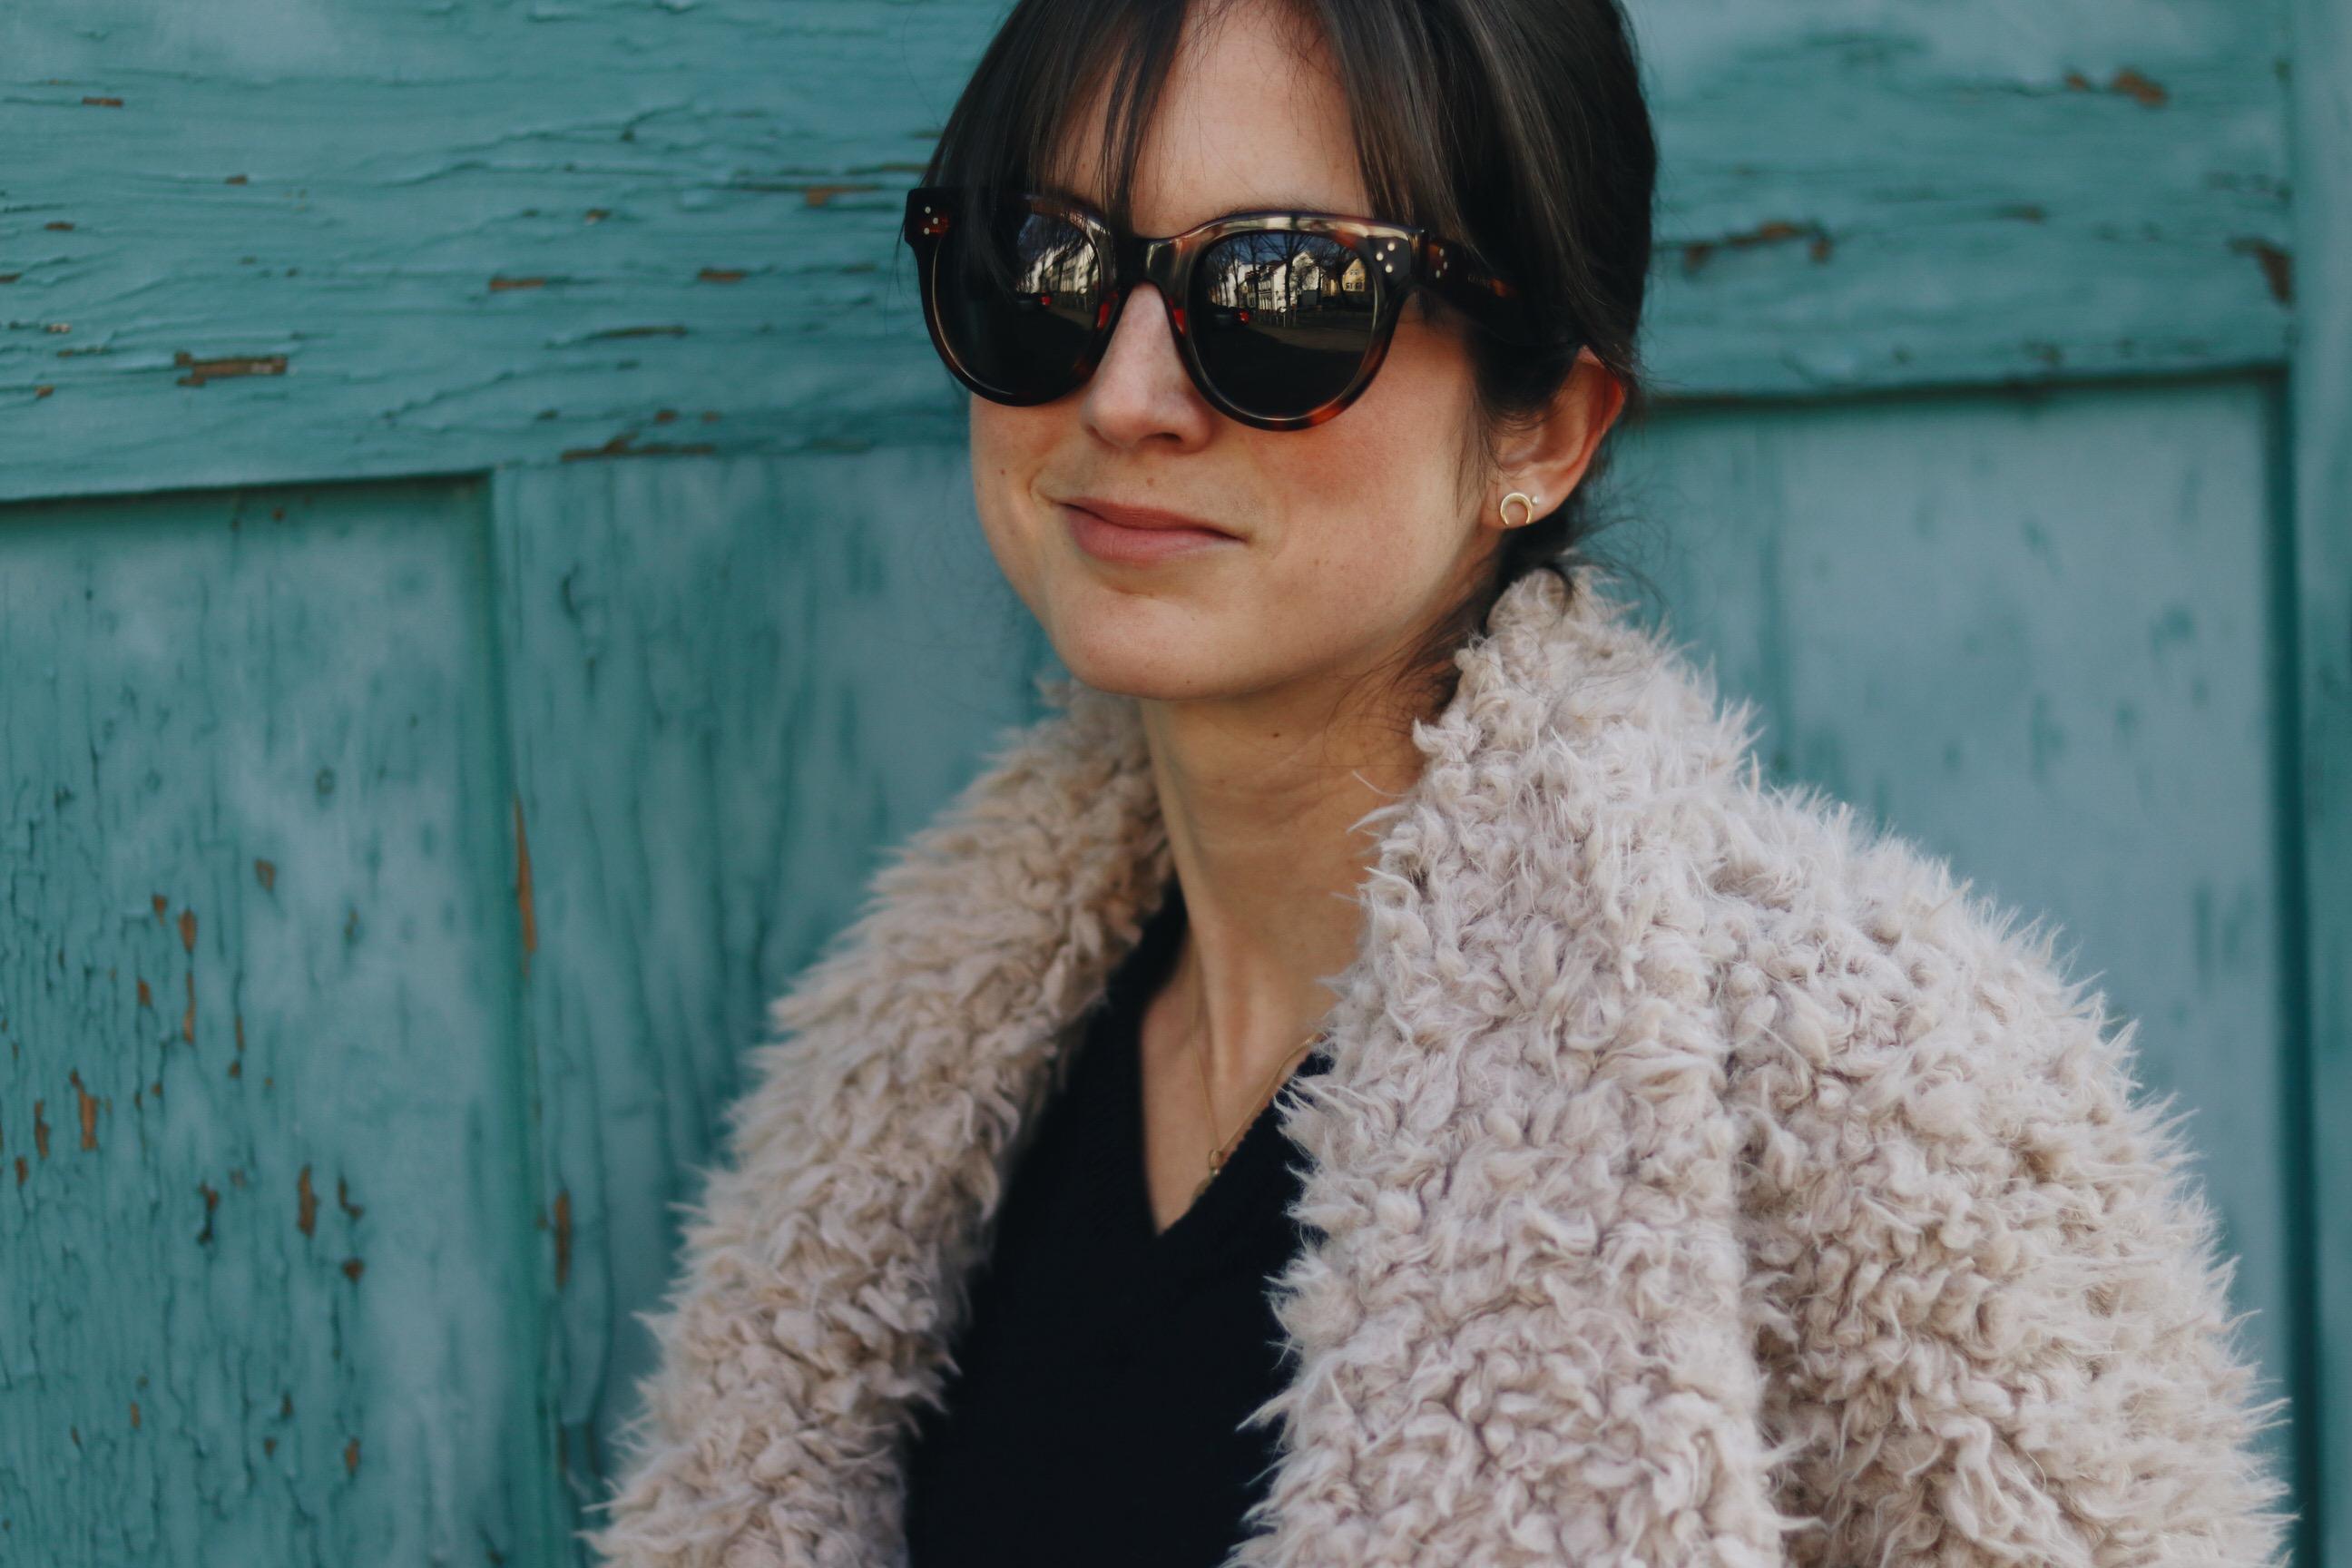 Fake Fur Jacke Winter Look Outfit Celine Sonnenbrille Freiburg Blog